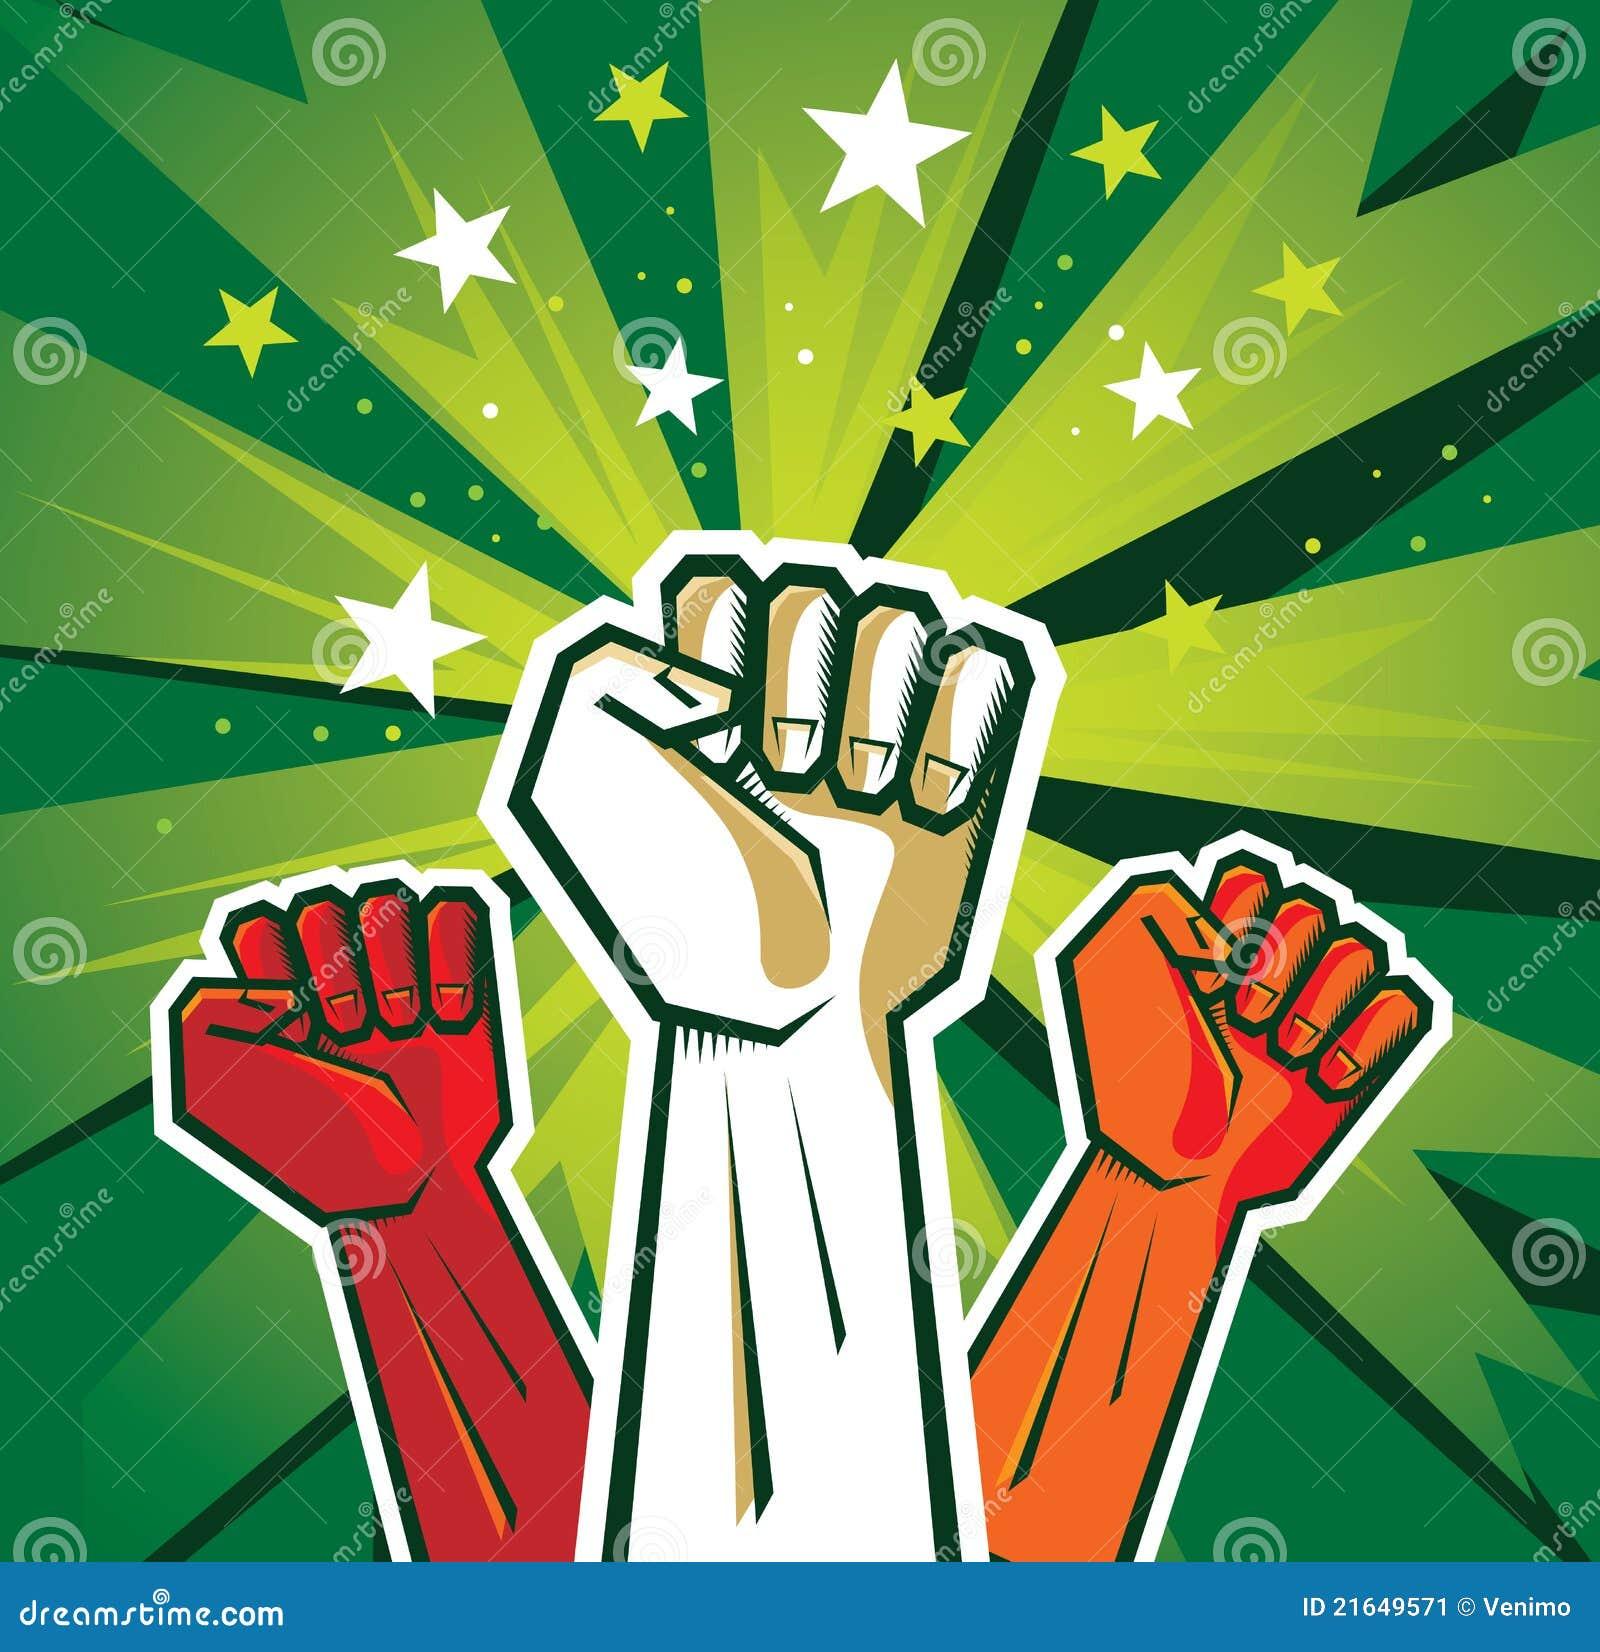 Revolution Hand Poster Stock Vector. Illustration Of Power